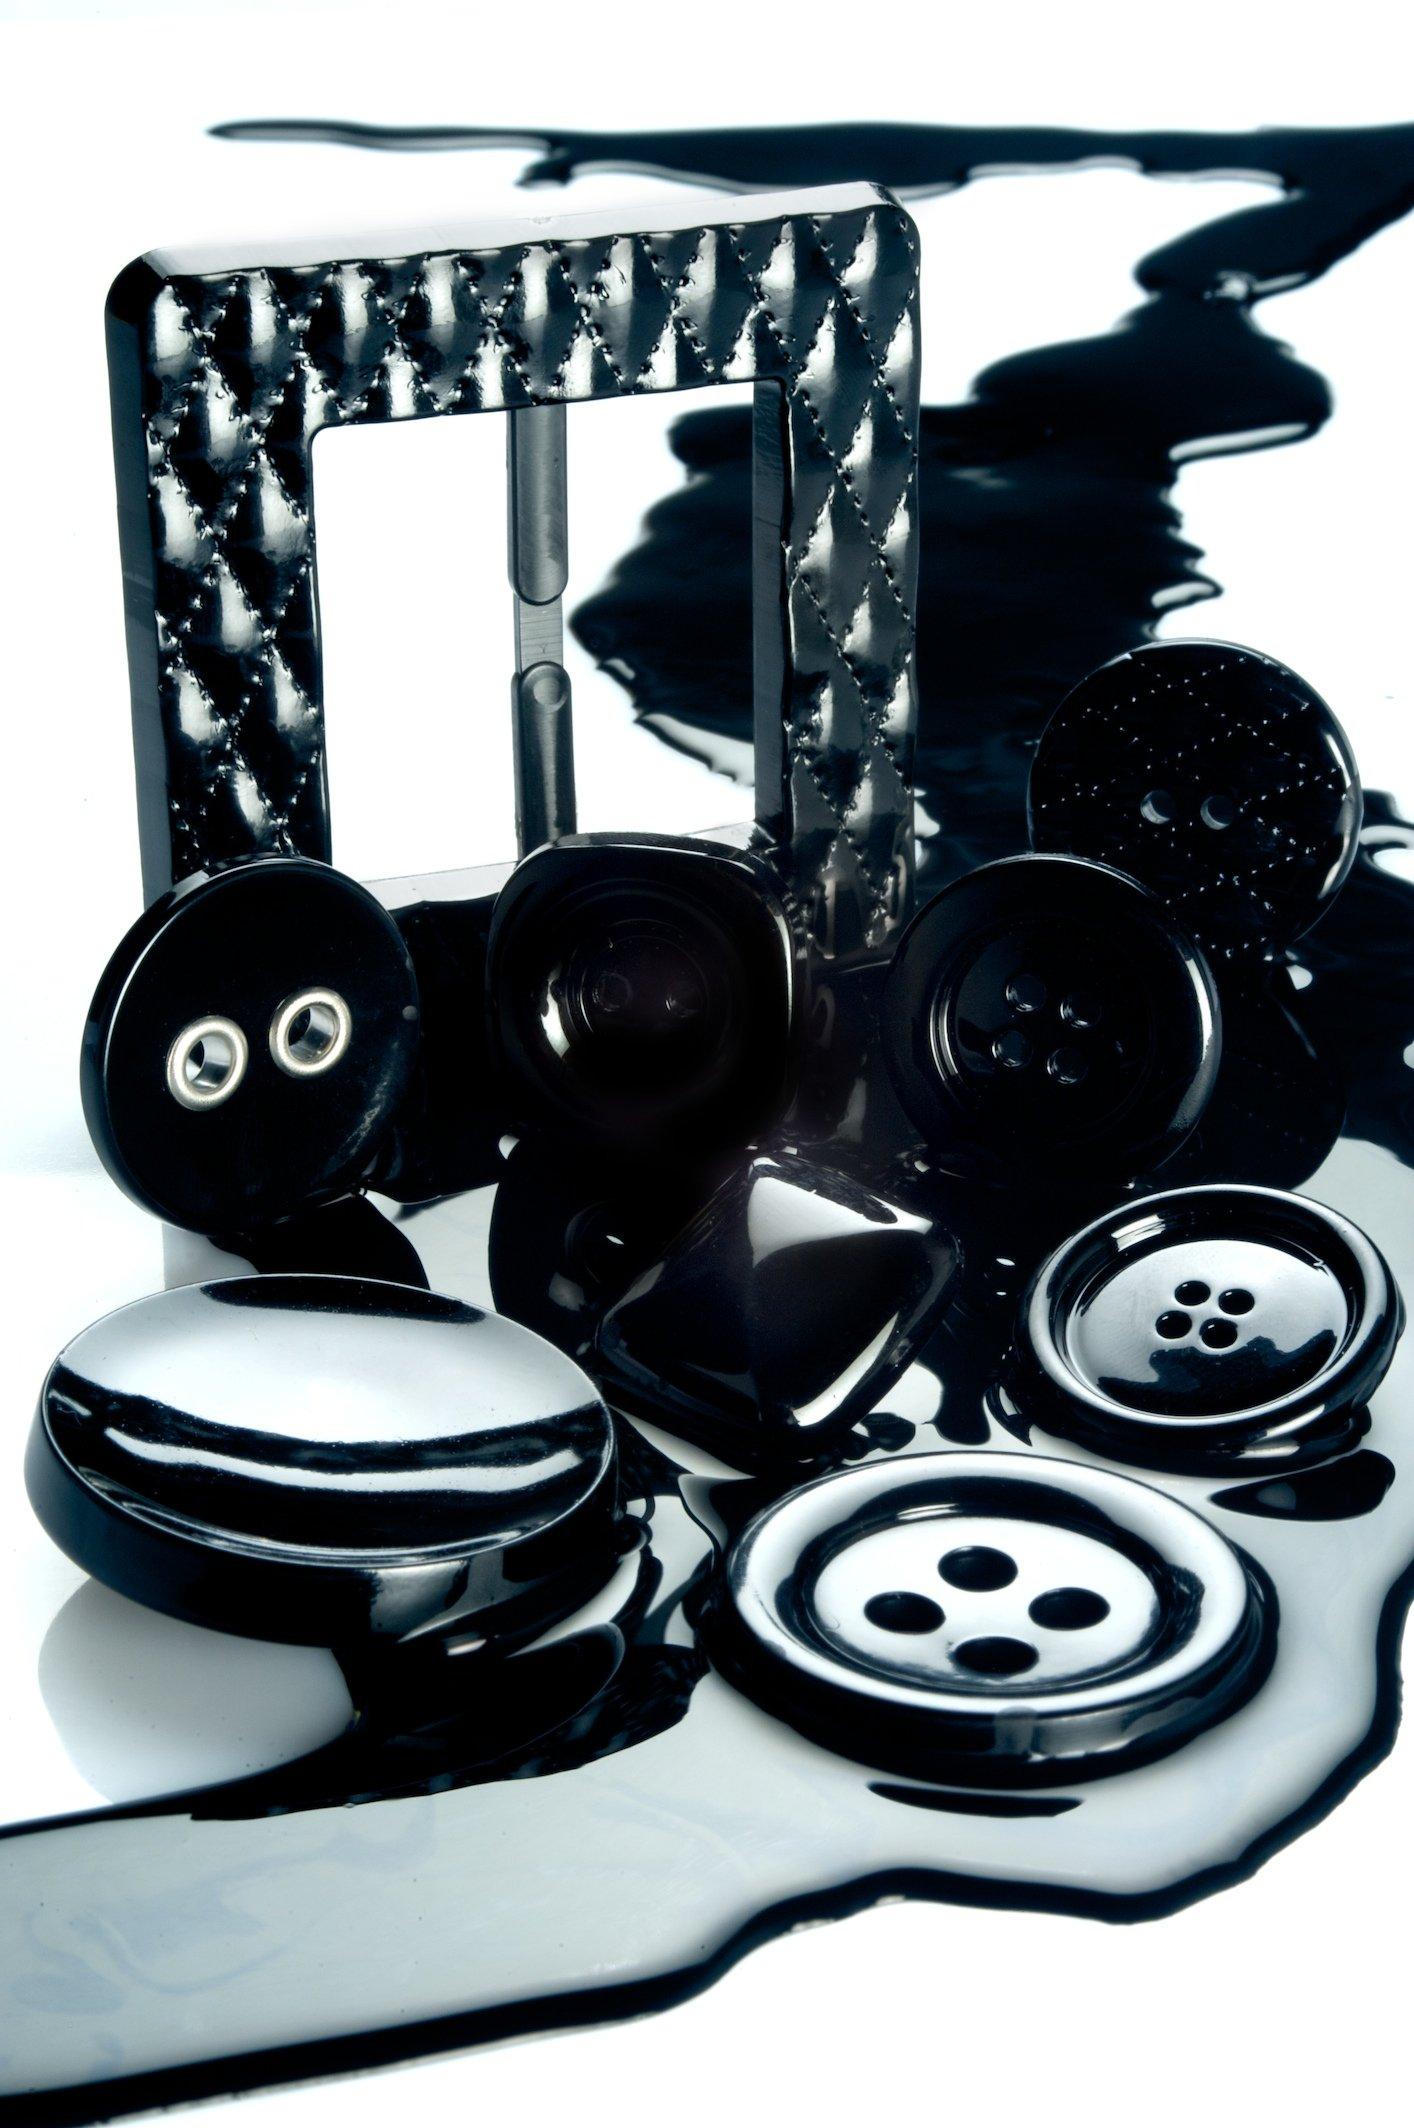 Bottoni e fibbia neri